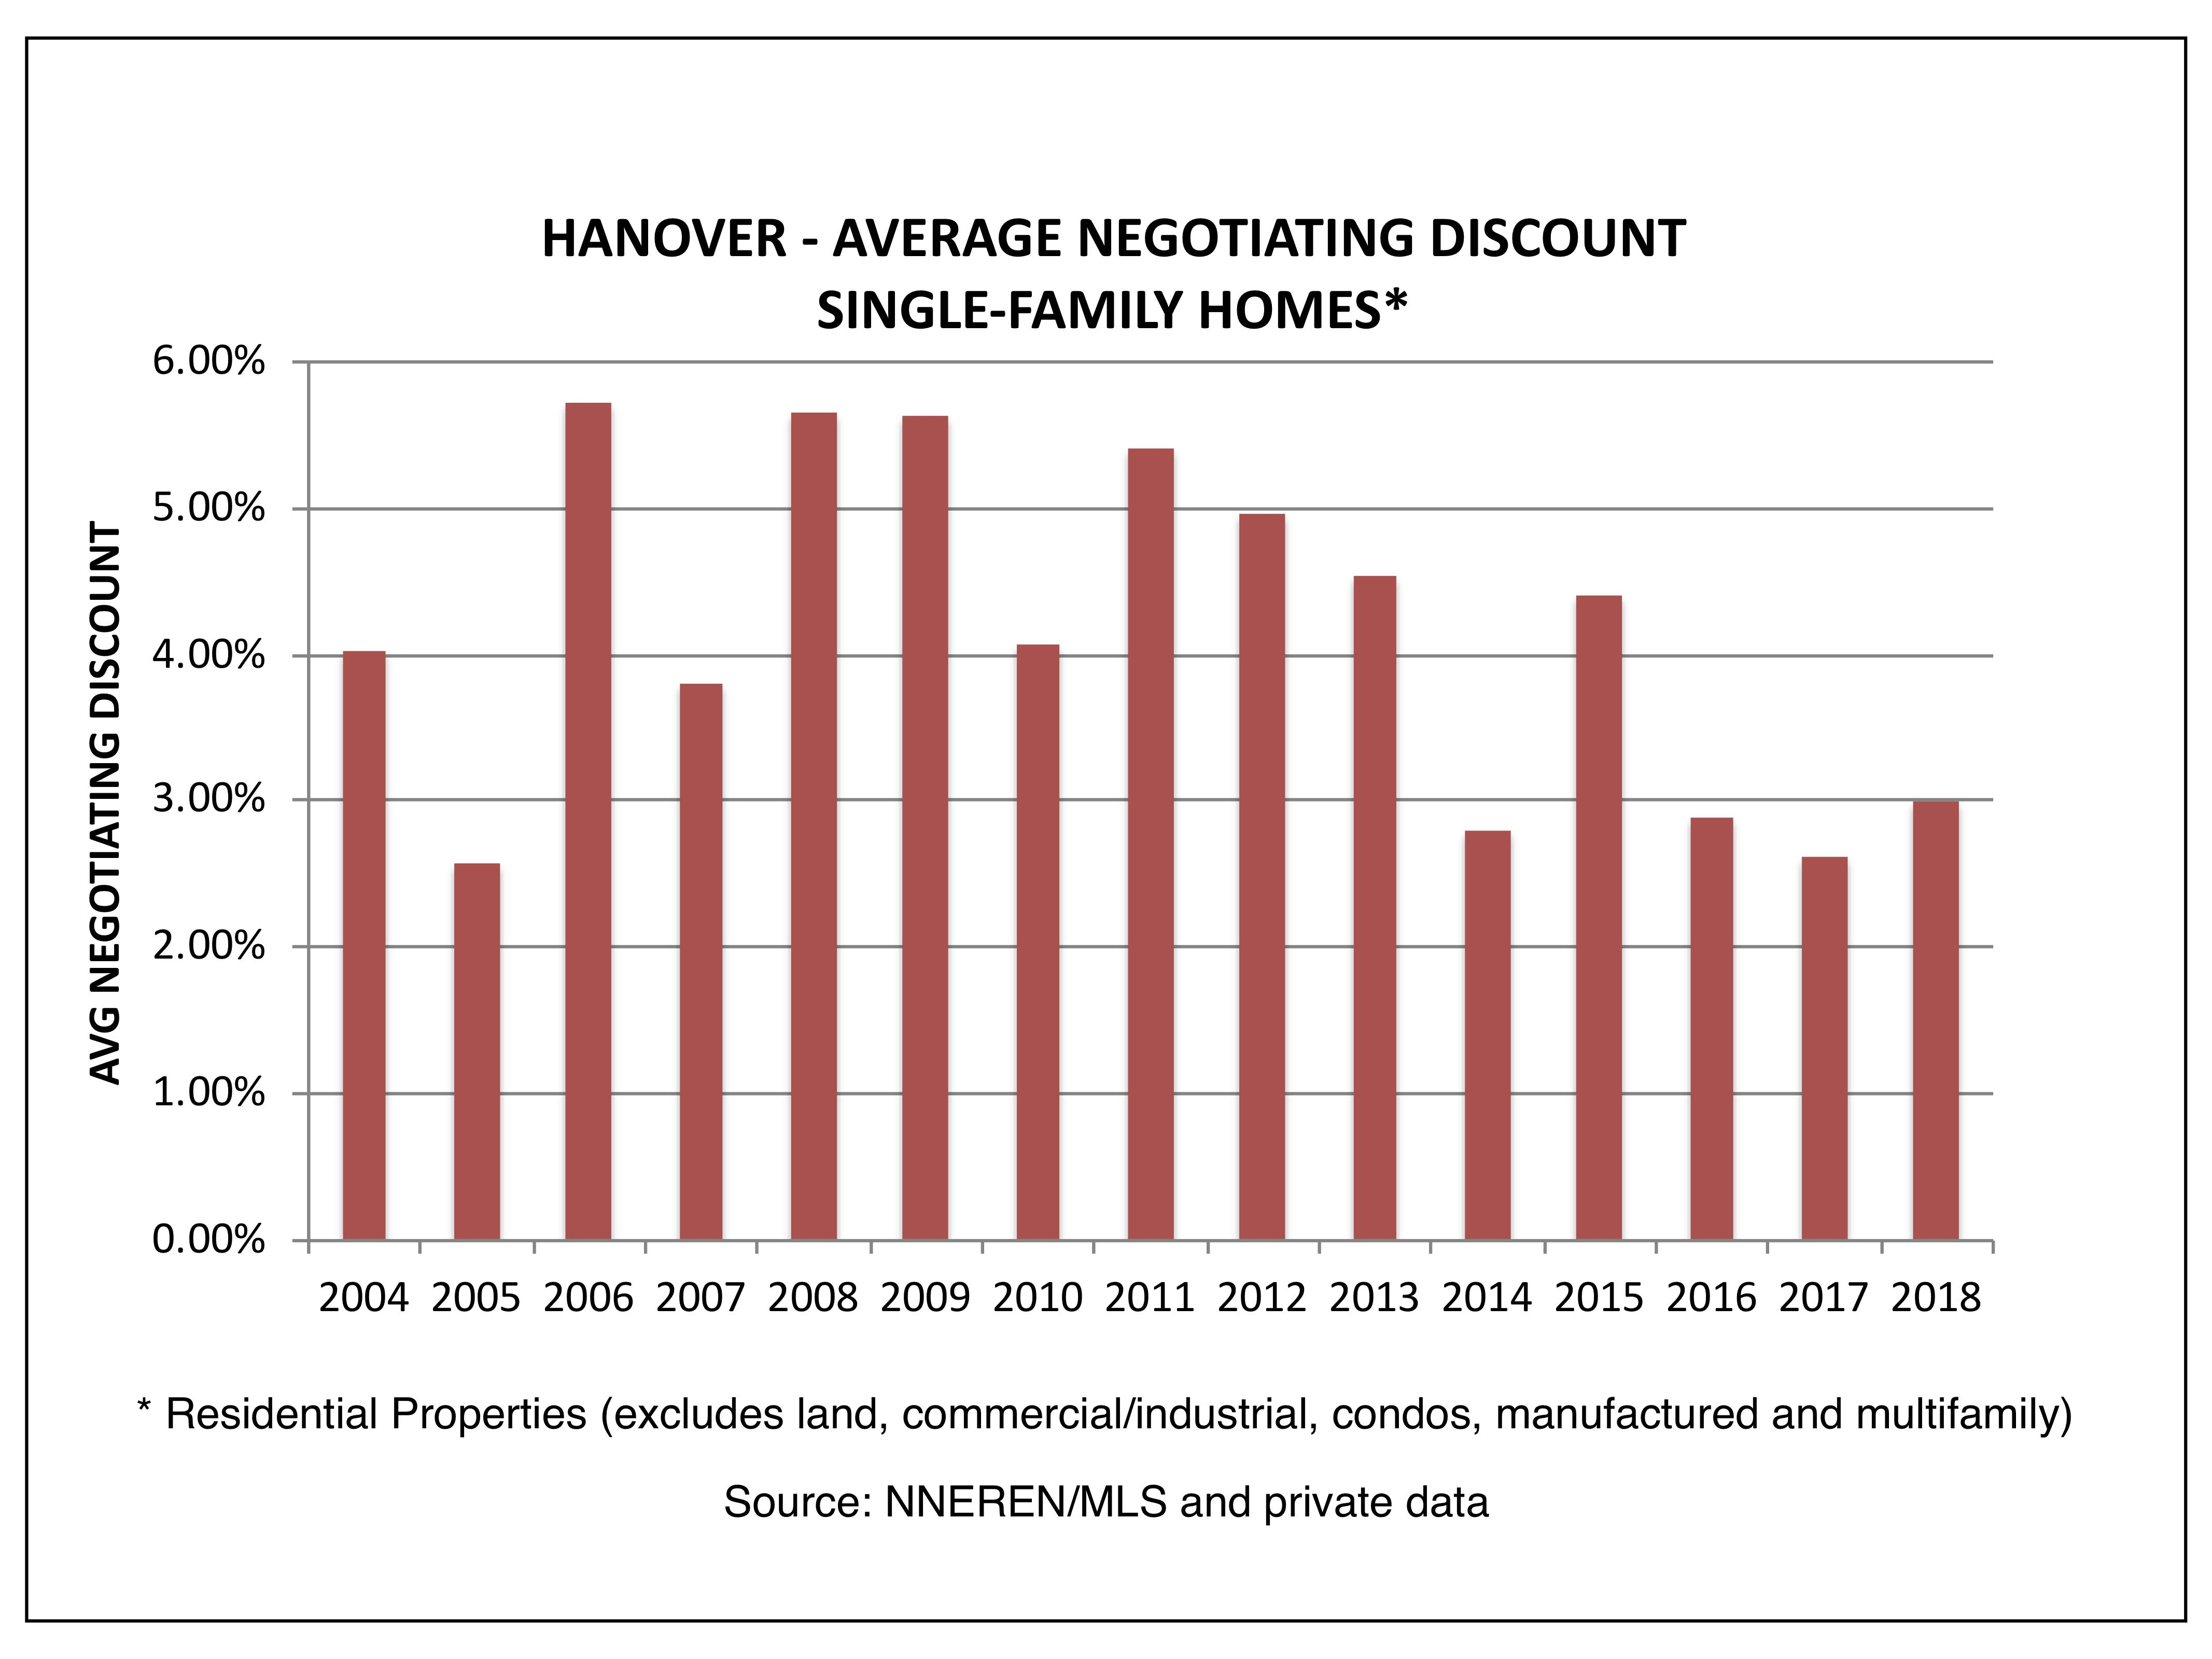 Hanover NH Real Estate - Average Negotiating Discount, Sold Homes